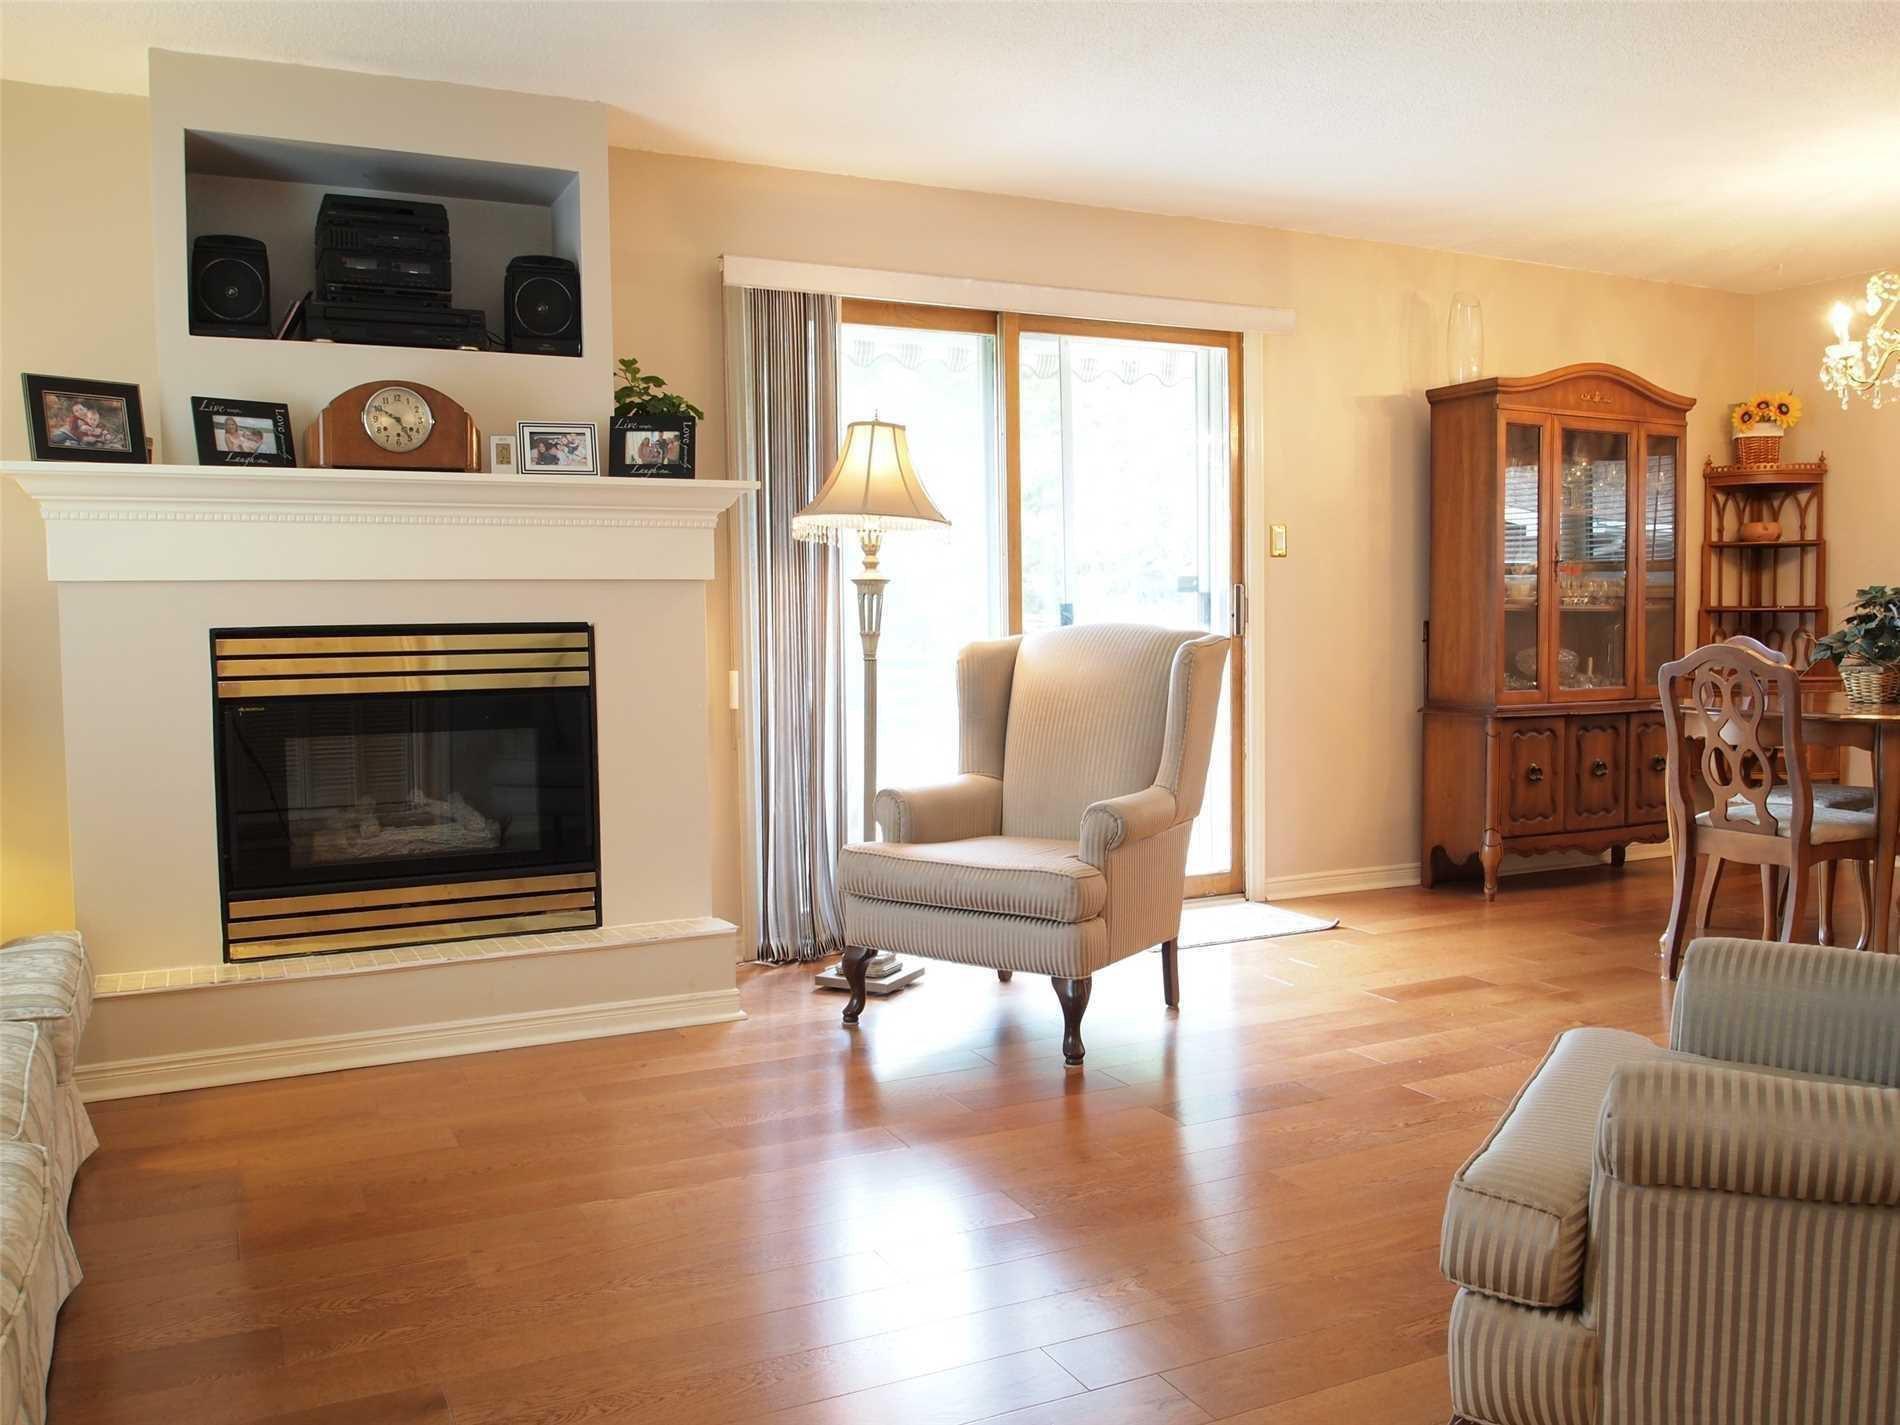 Photo 7: Photos: 105 Fifth Street in Brock: Beaverton House (Bungalow) for sale : MLS®# N4564596